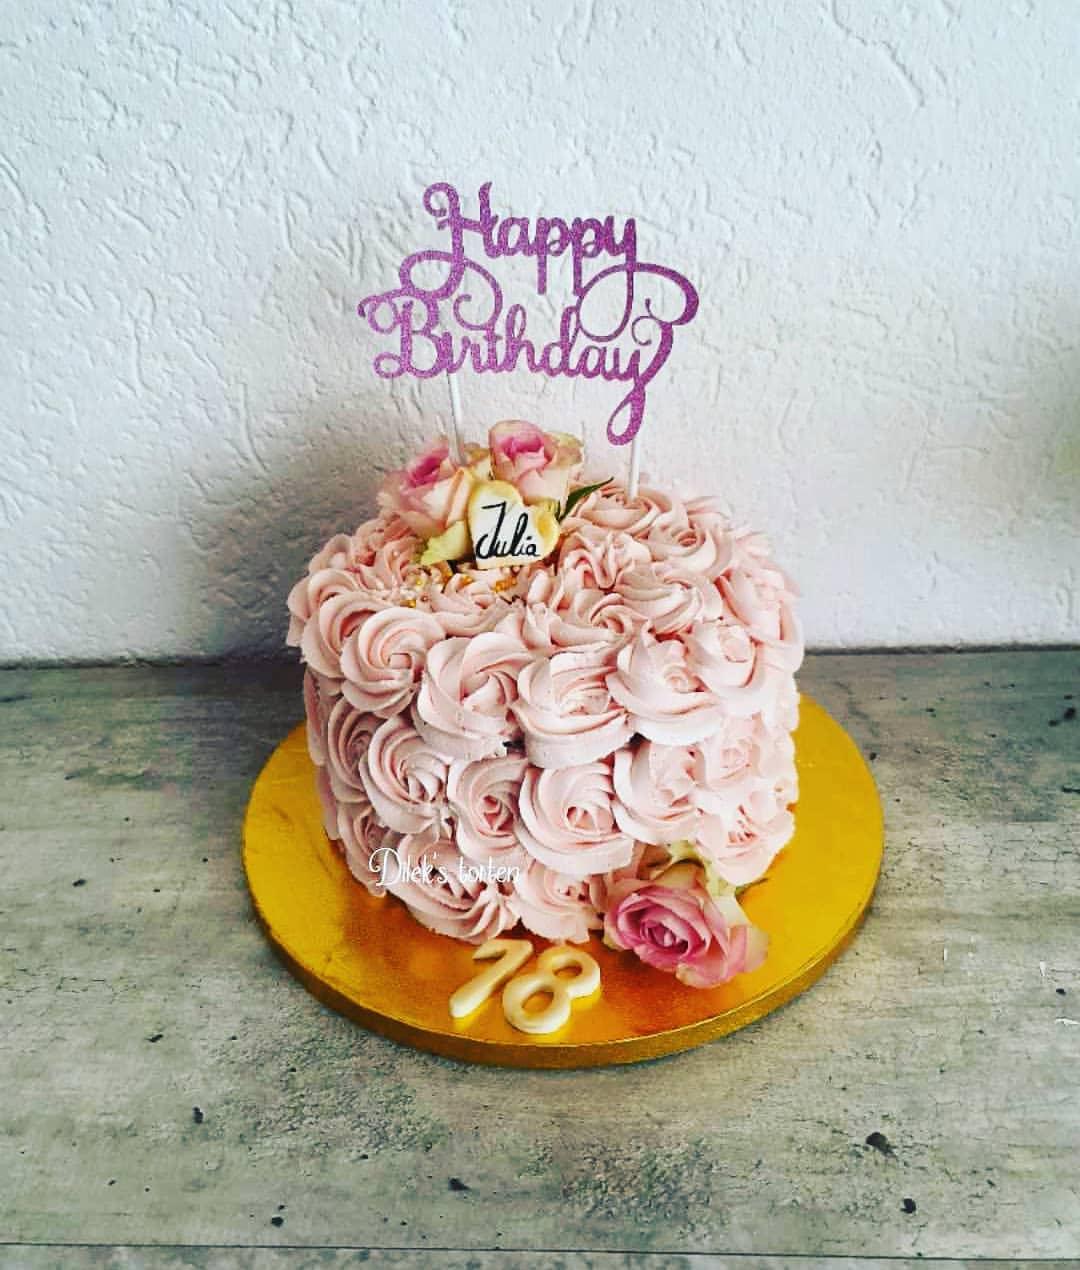 Tortendeko 18 Geburtstag Schön Urime Ditlindje Balajrina 🤗 Flamingo Club Birthday